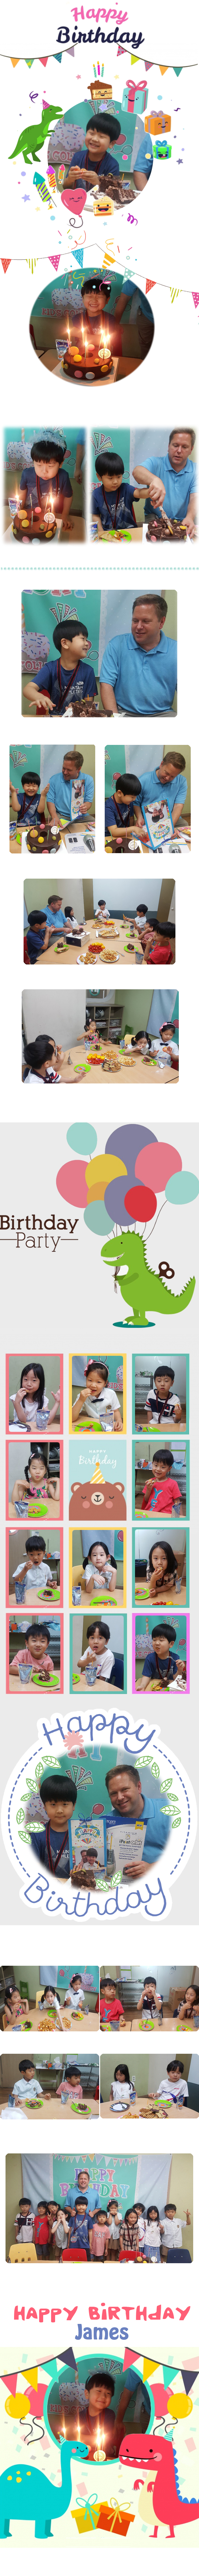 James_Birthday.jpg